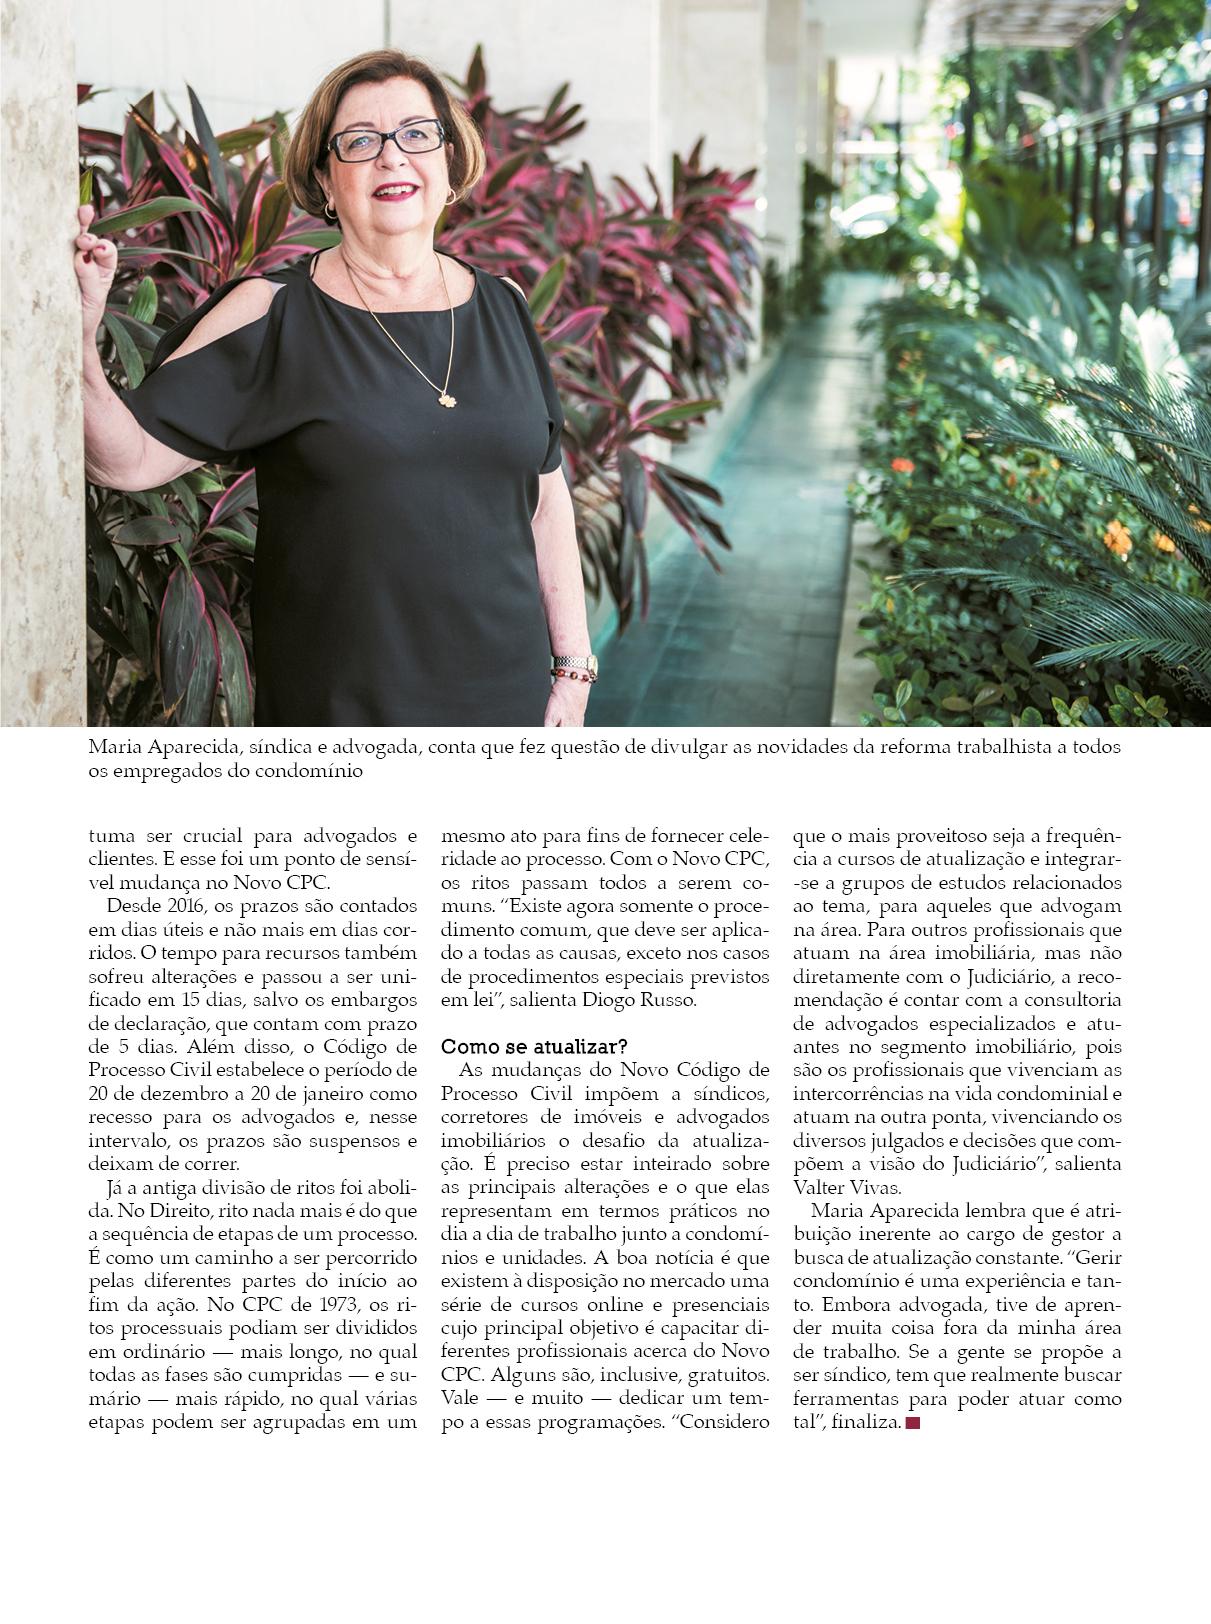 Revista Síndico_ed 242_51